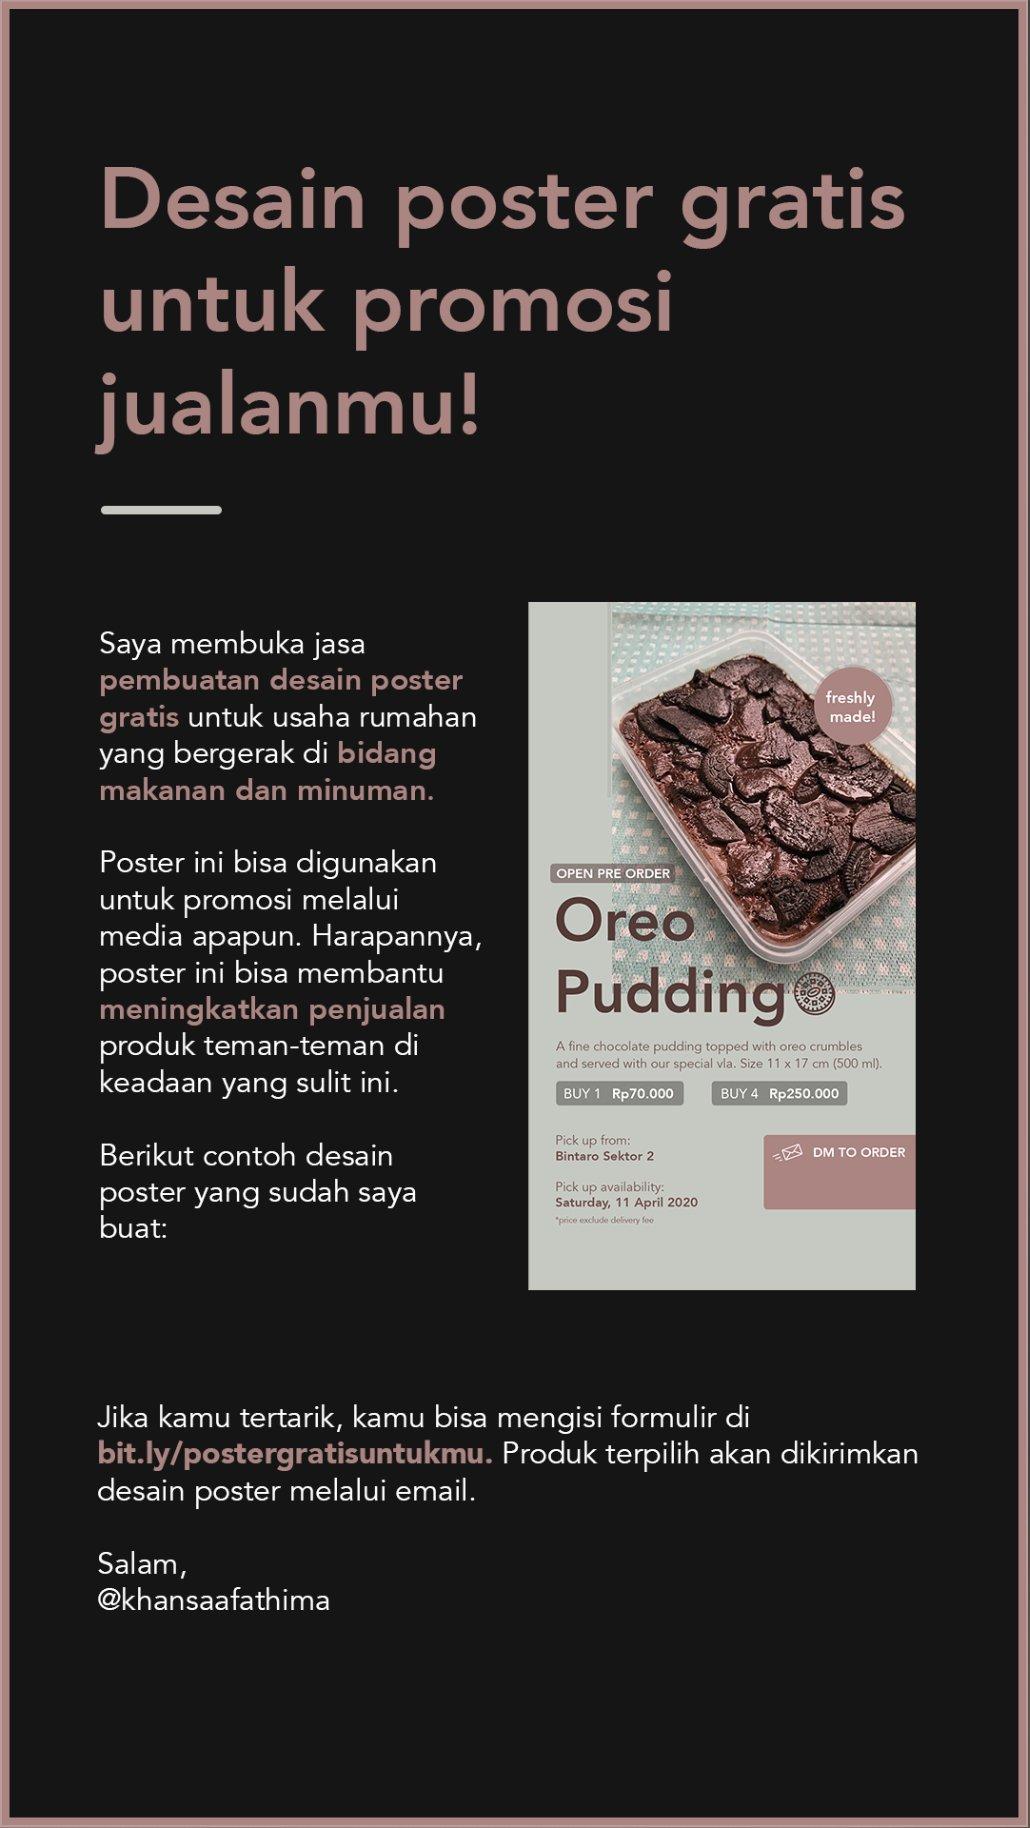 Khansaa على تويتر Desain Poster Gratis Untuk Promosi Jualanmu Saya Membuka Jasa Pembuatan Desain Poster Gratis Untuk Usaha Rumahan Yang Bergerak Di Bidang Makanan Dan Minuman Dirumahaja Isi Formulir Ini Untuk Mendapatkannya